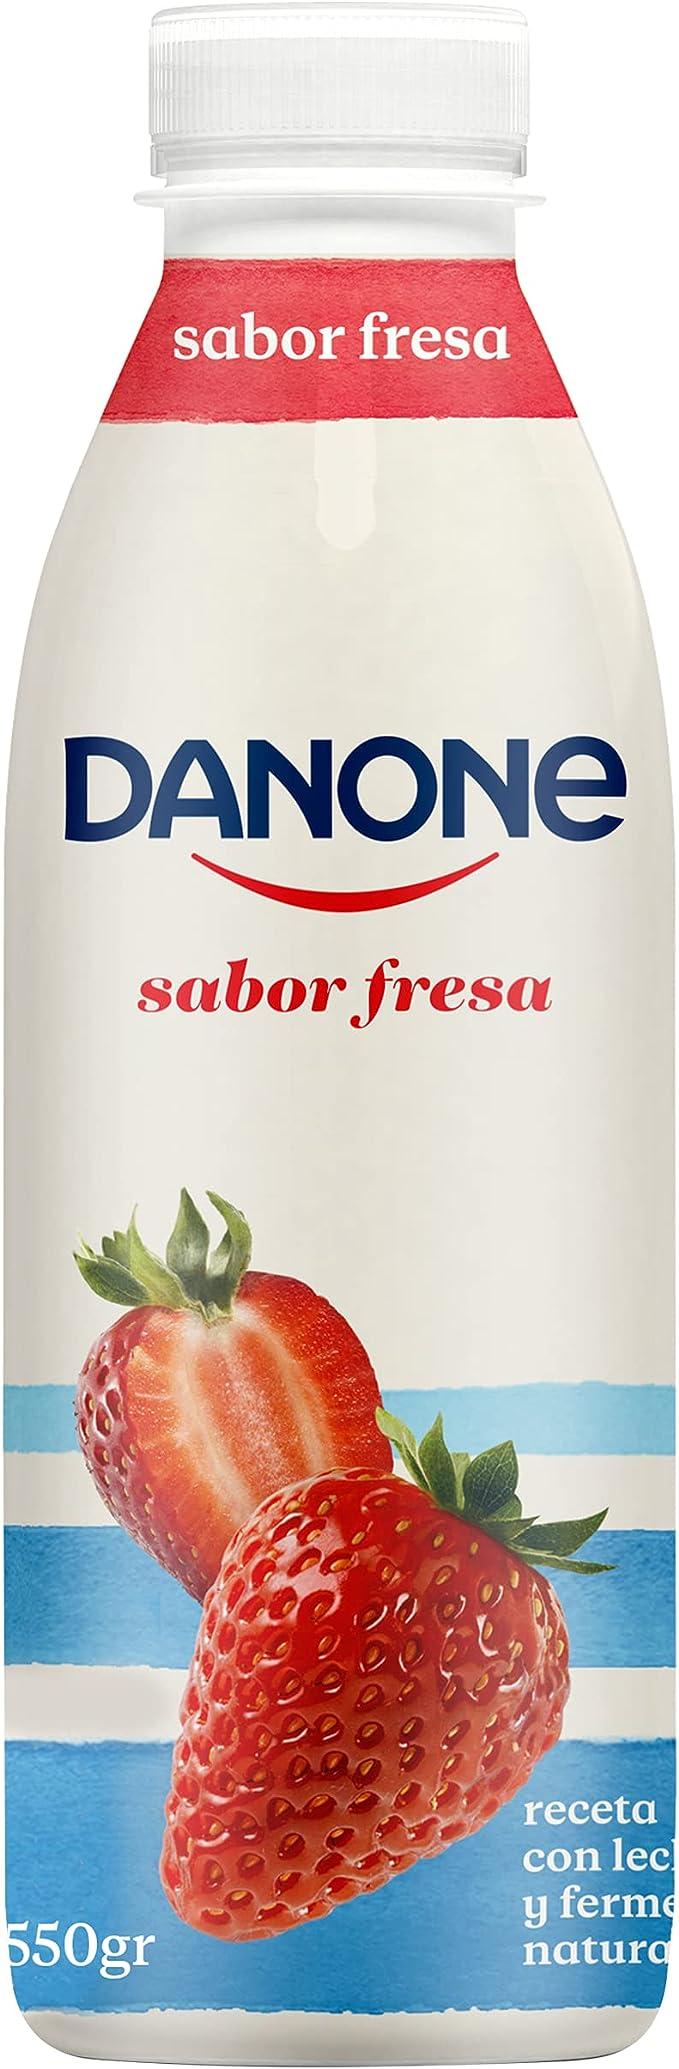 Danone para Beber Fresa, 550g